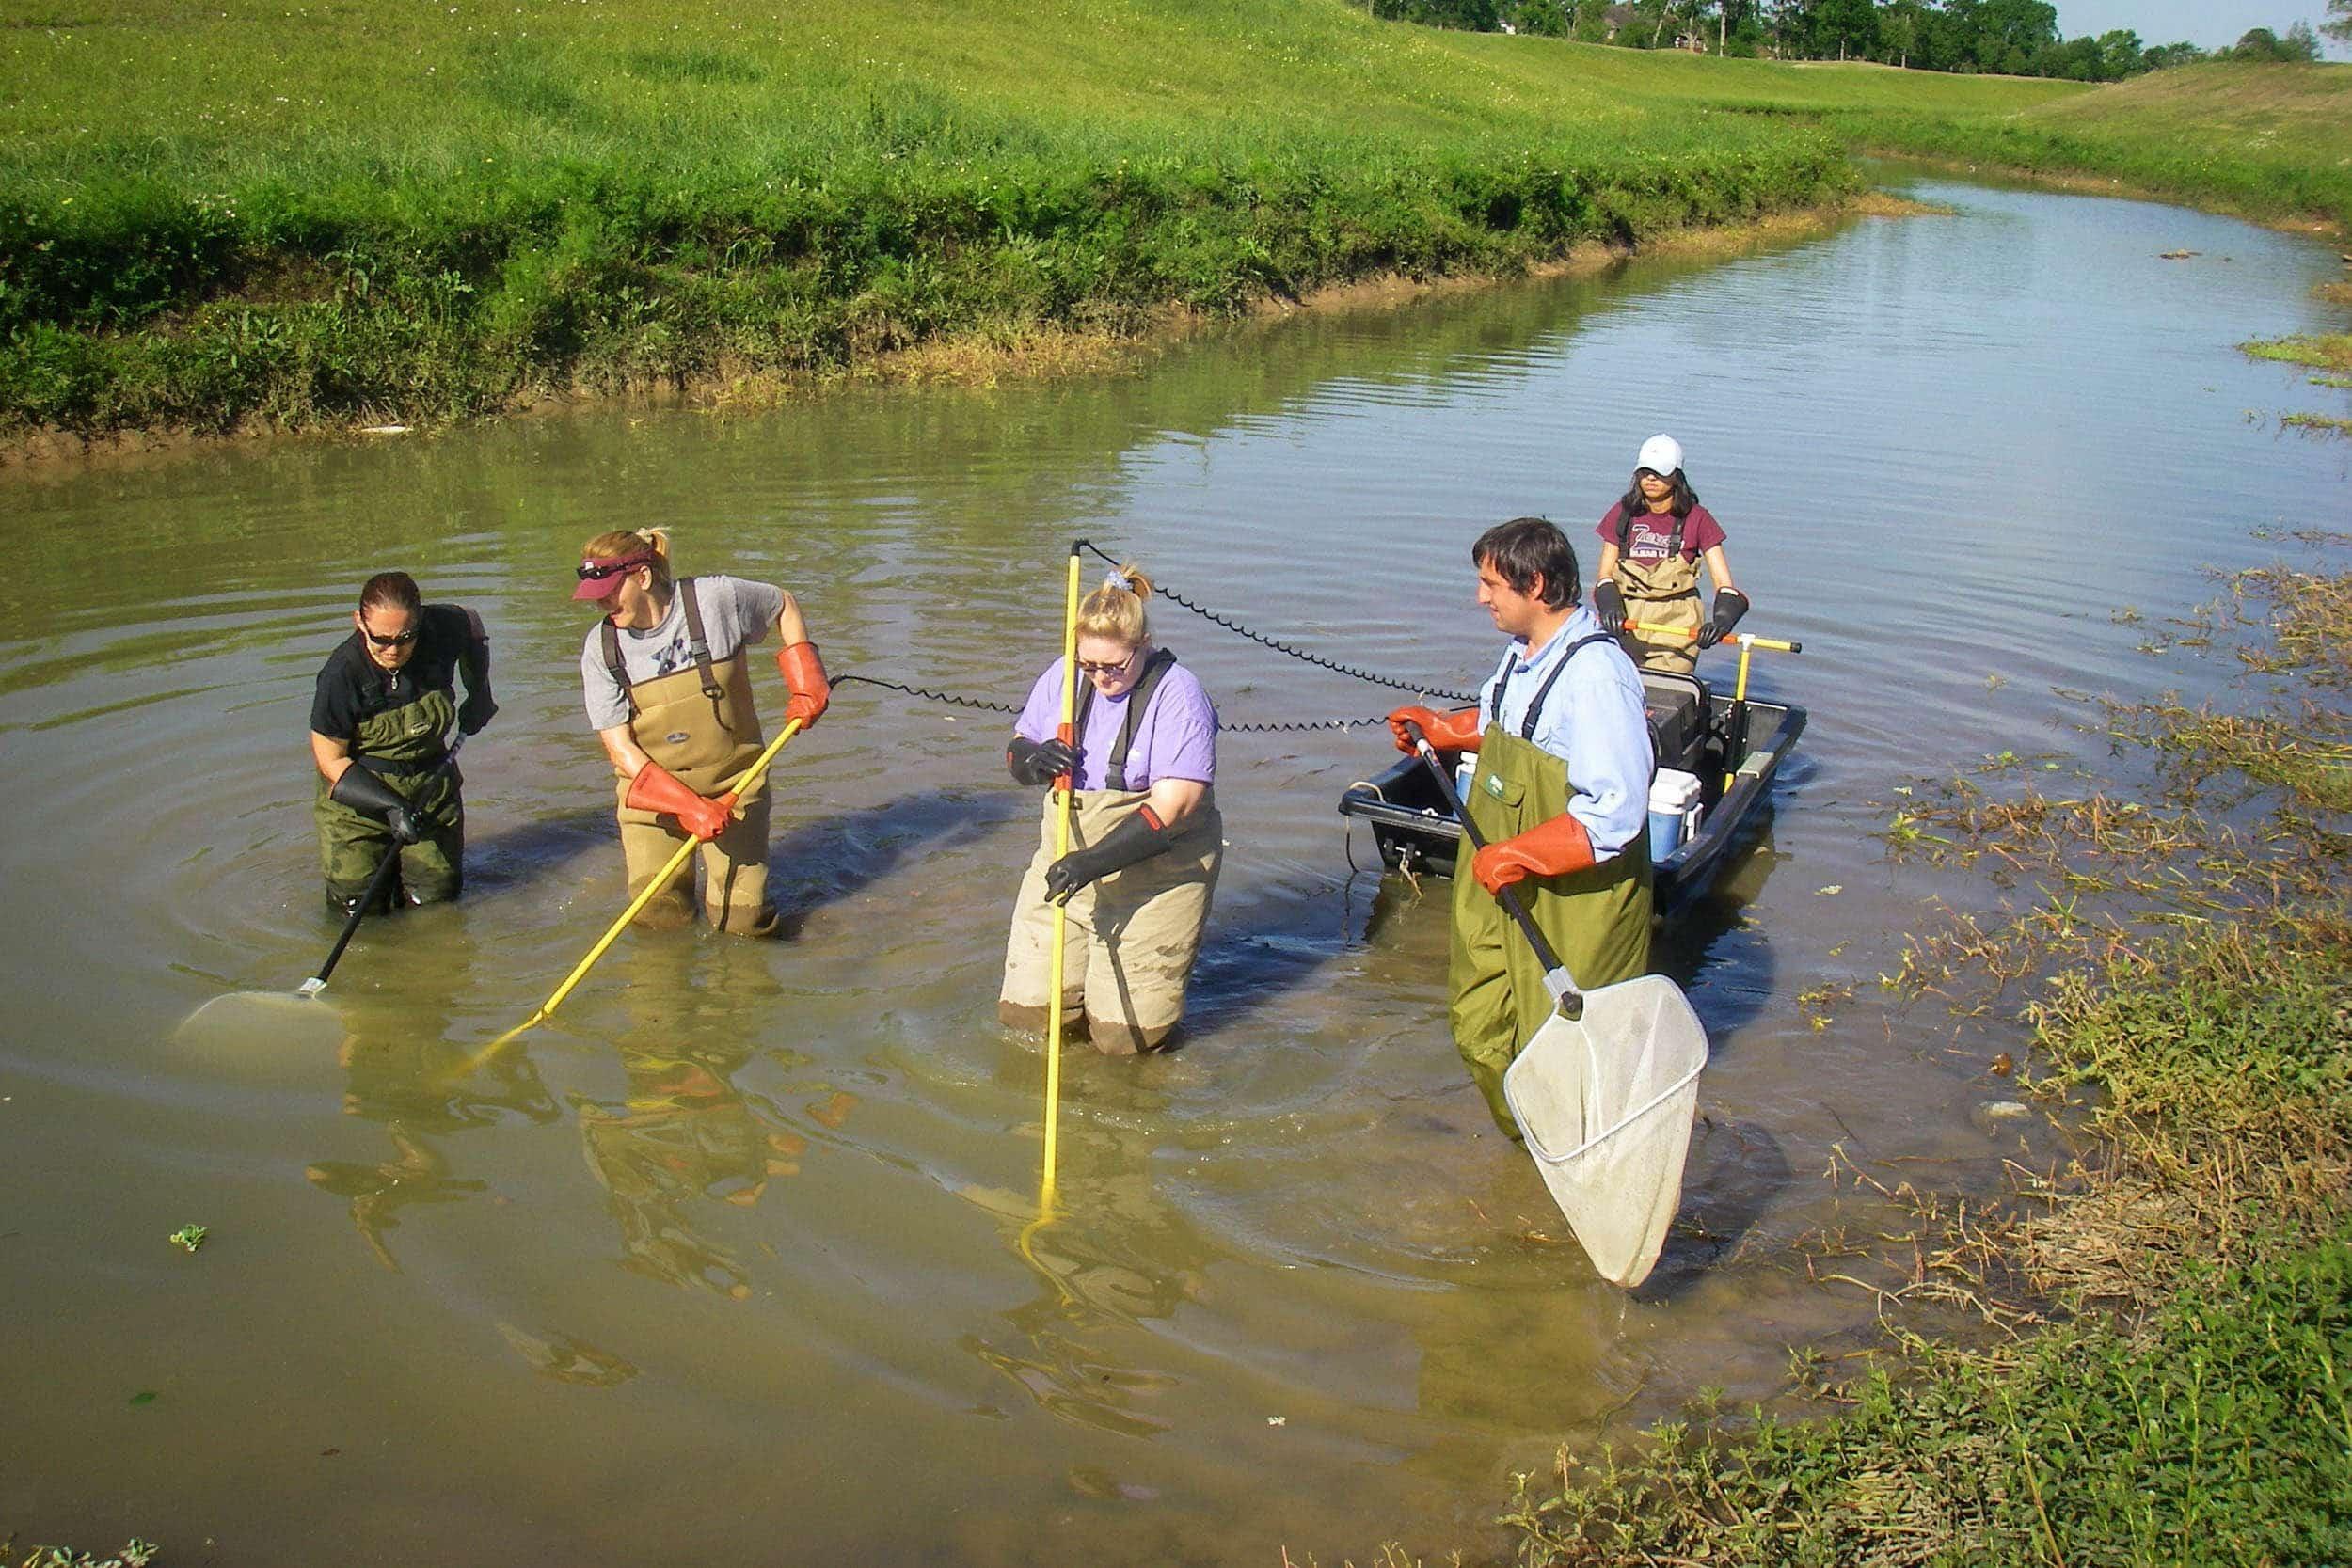 Sampling in Horsepen Bayou are research assistants Kate Leathers, Jayne Vidas, Nicole Fearnley (undergraduate student), Michael Franks and Priyanka Lokanath